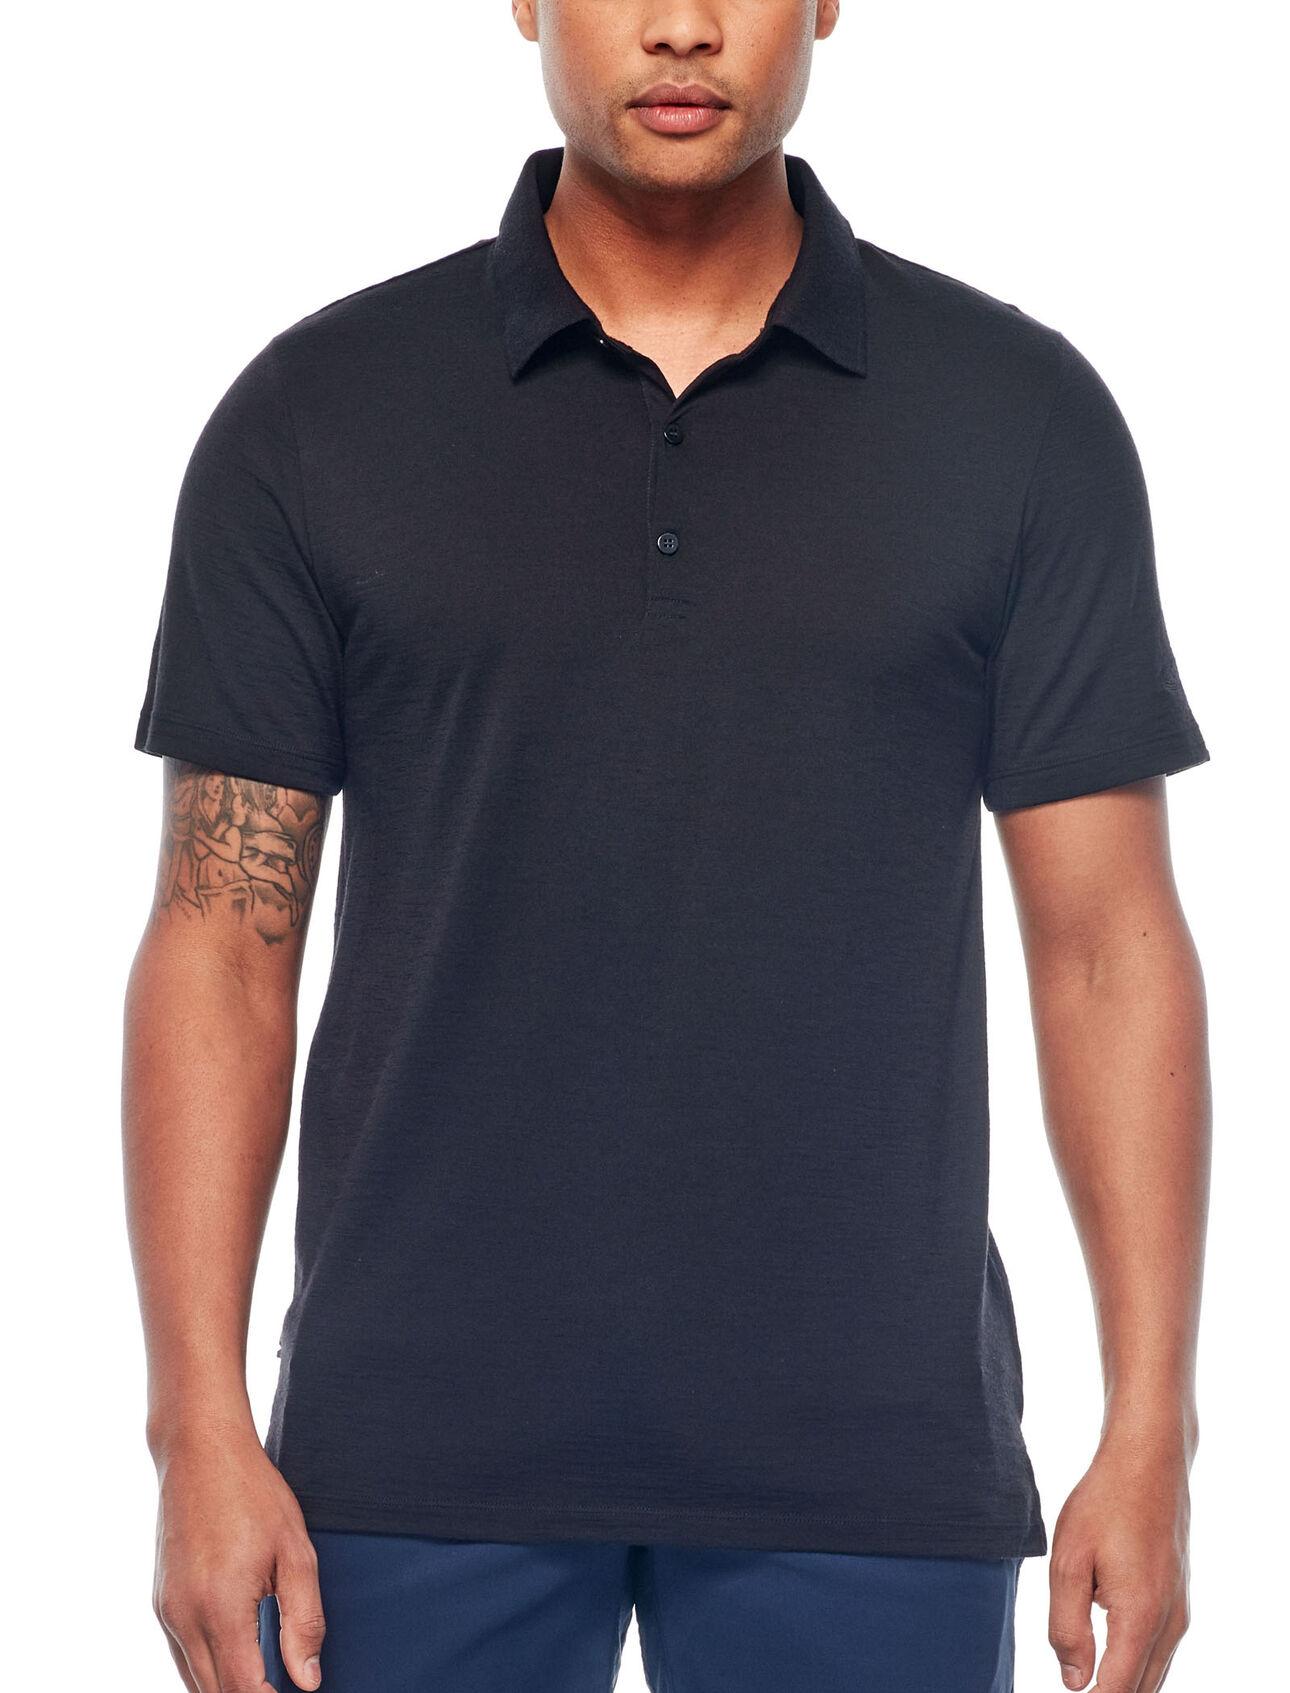 Merino Tech Lite Poloshirt